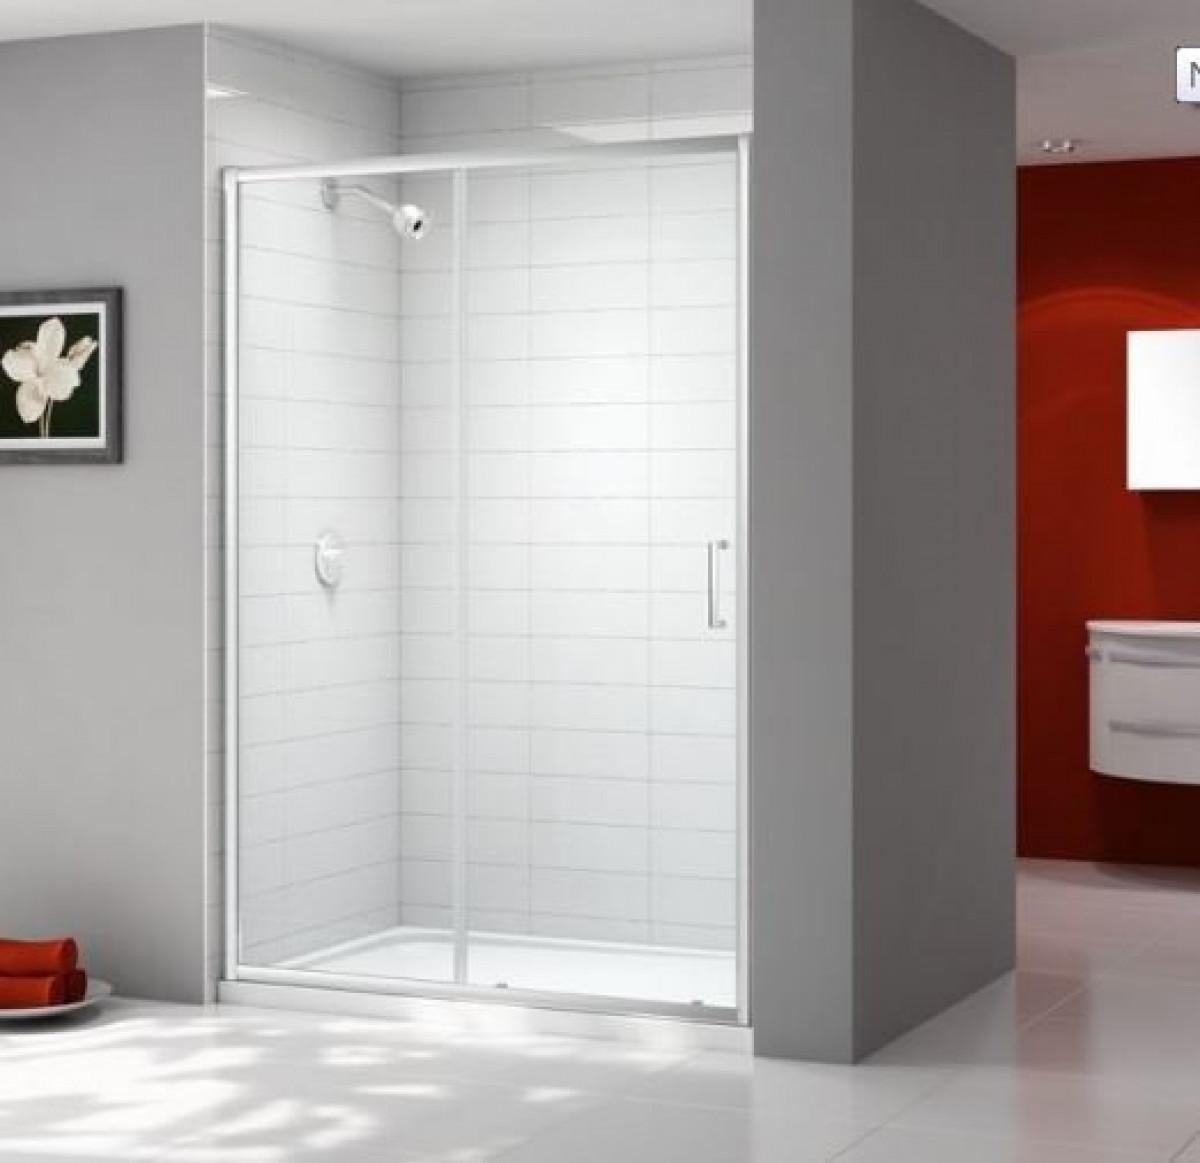 Merlyn Ionic Express 1200mm Sliding Shower Door A0304c0